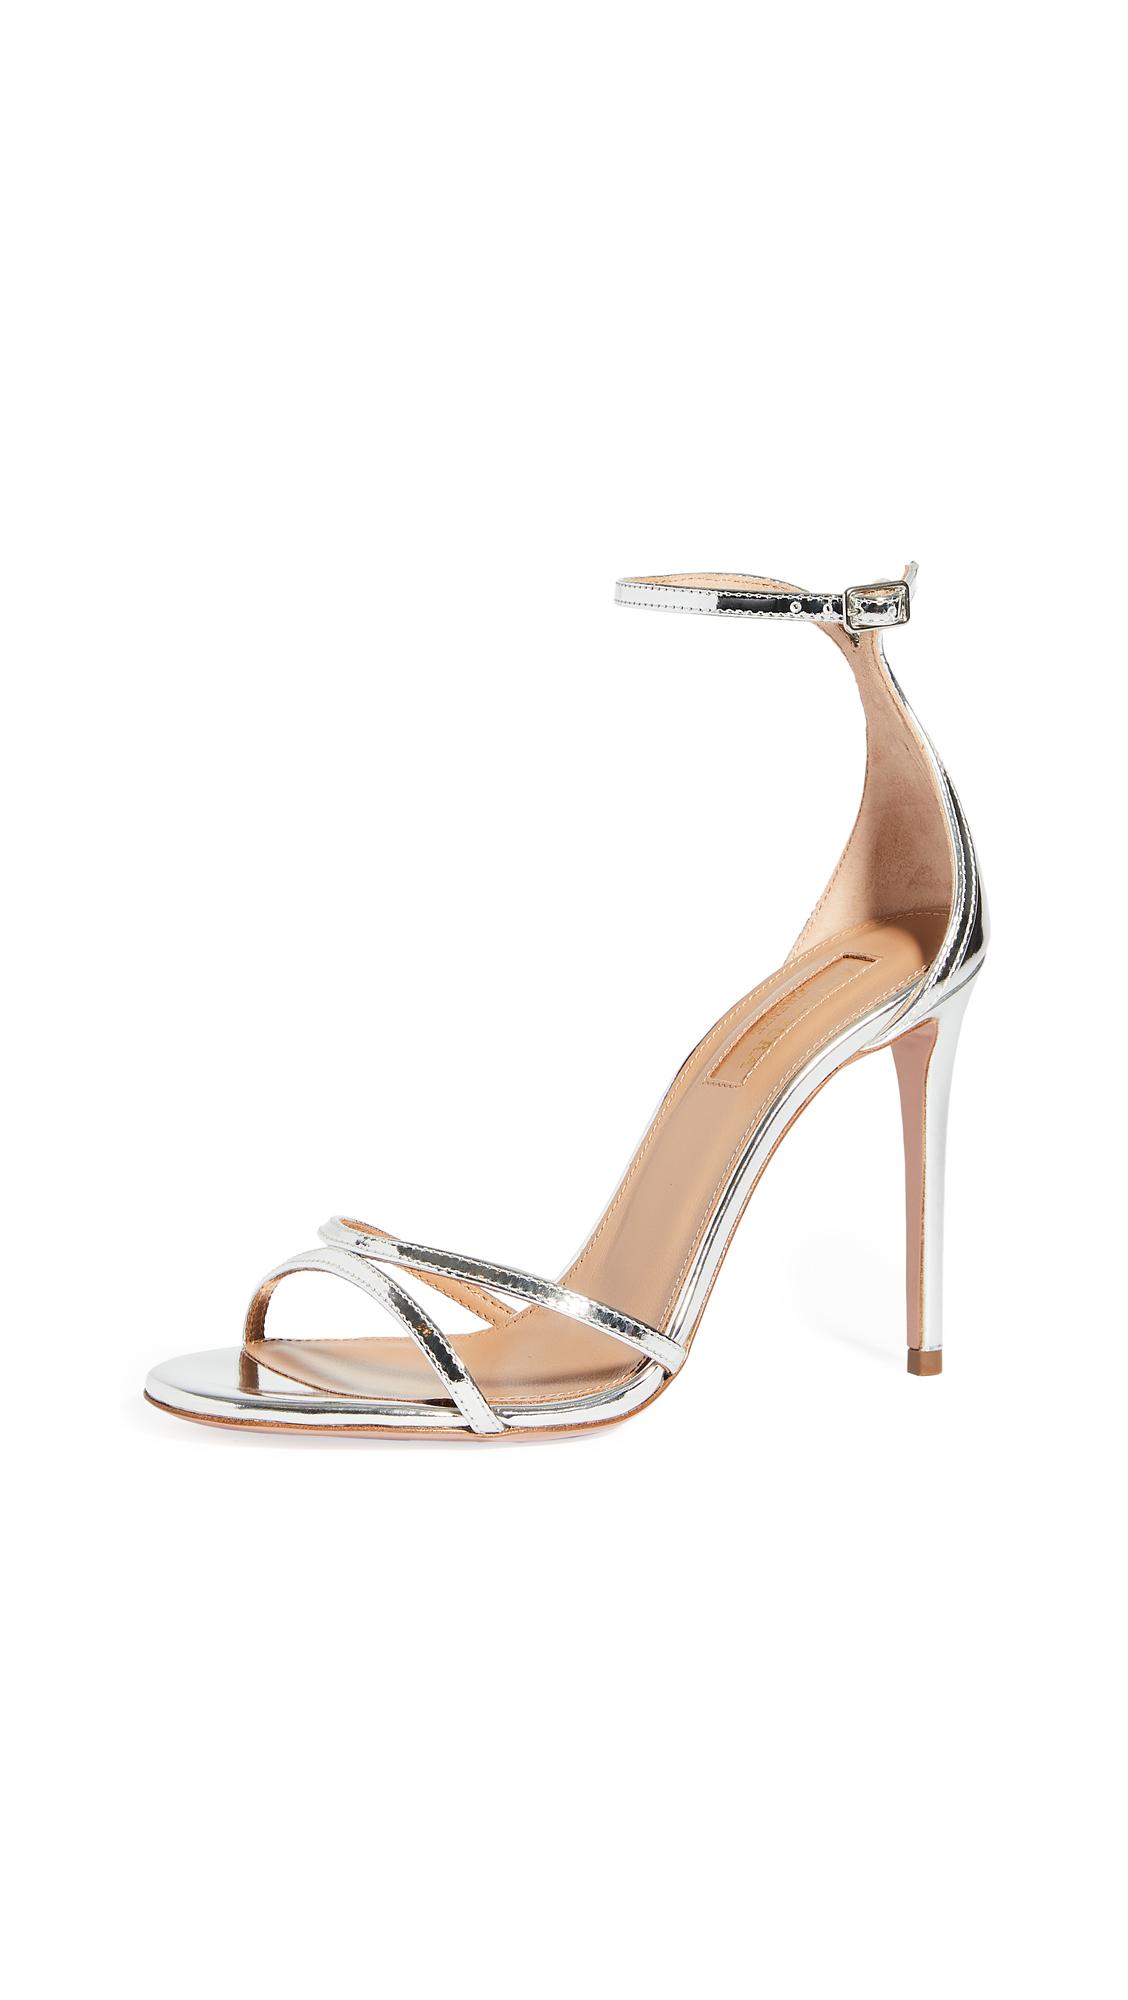 Aquazzura 105mm Purist Sandals